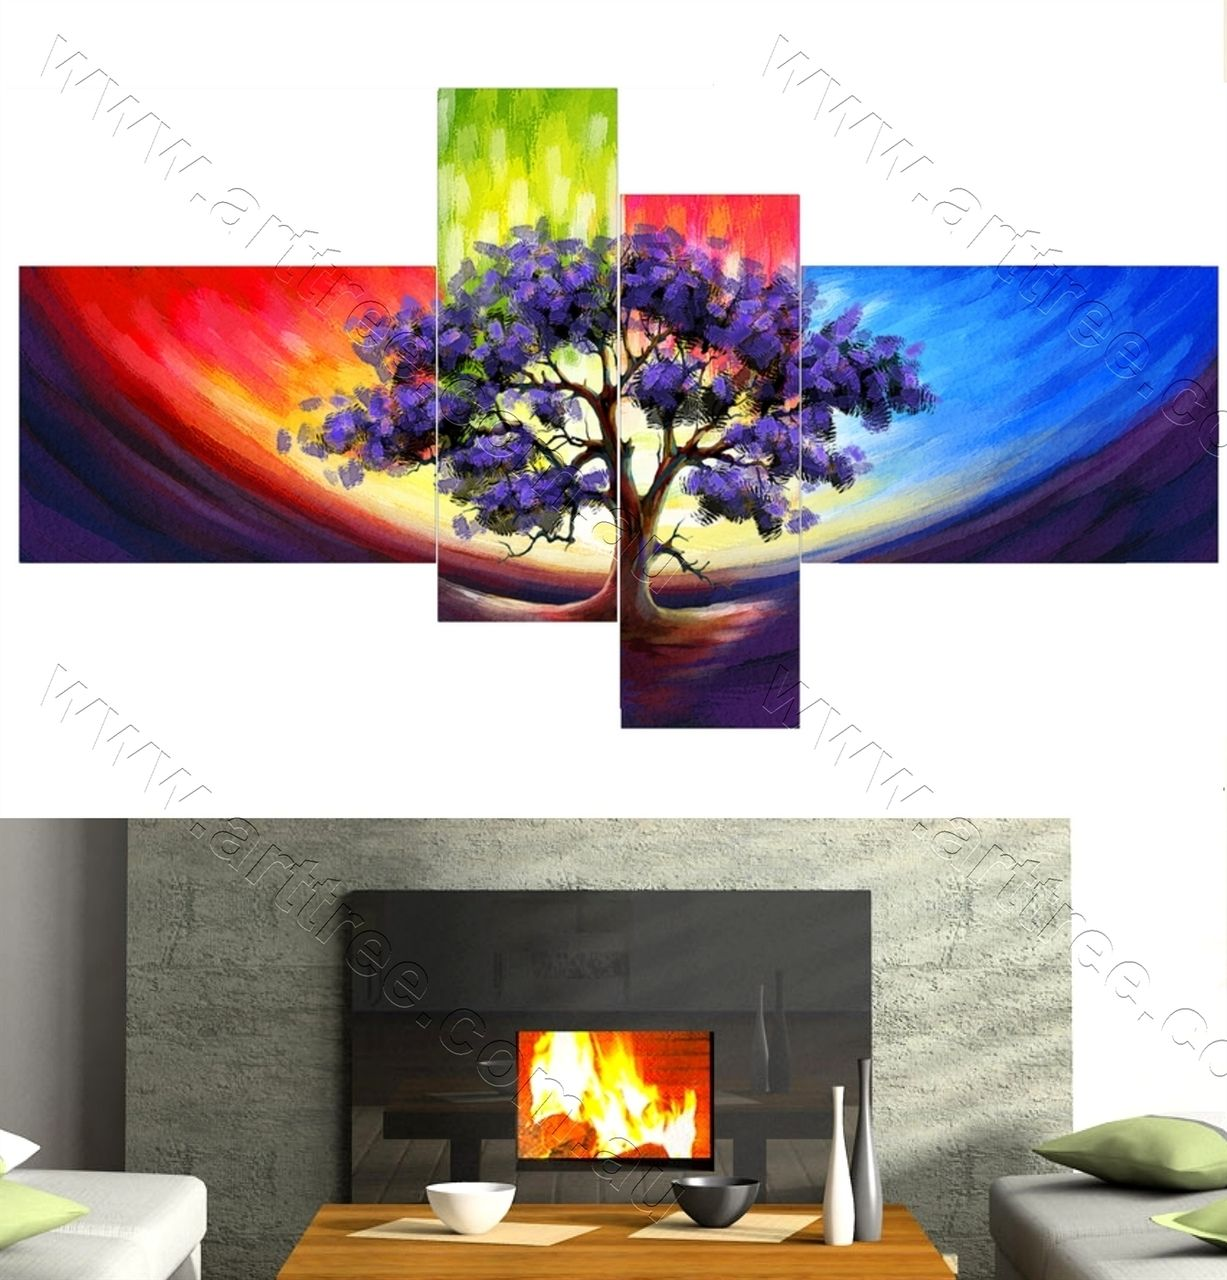 Purple Leaves Tree 4 piece print set · Large Canvas PrintsWall Art OnlinePurple ...  sc 1 st  Pinterest & Purple Leaves Tree 4 piece print set | 4 Piece Canvas Prints ...